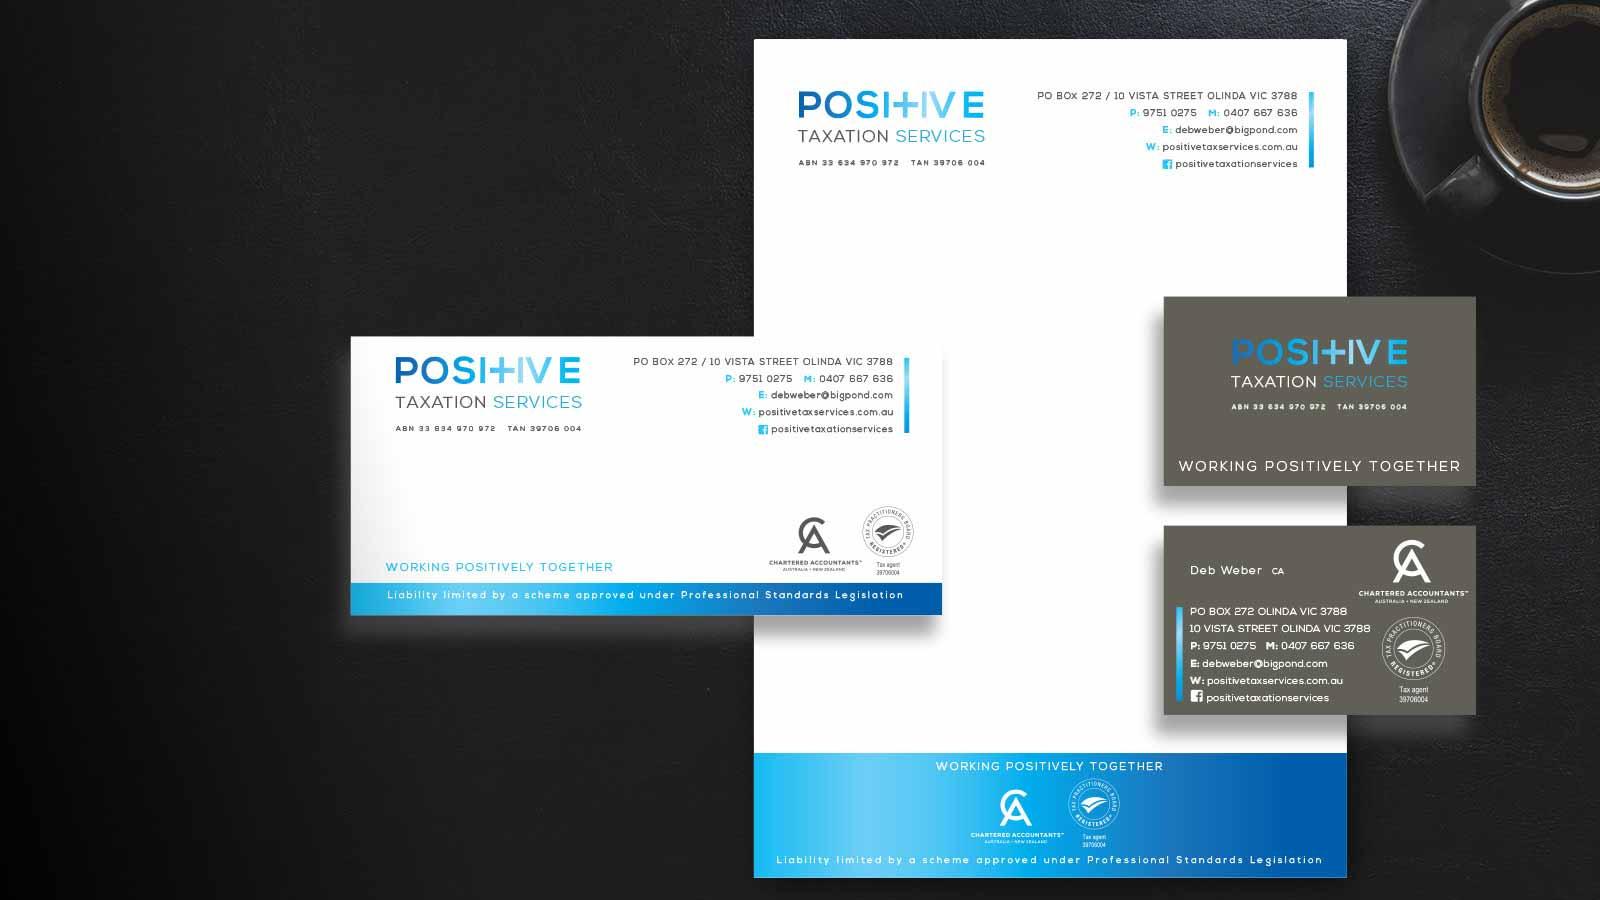 Positive-Taxation-Services-Stationery Design Melbourne